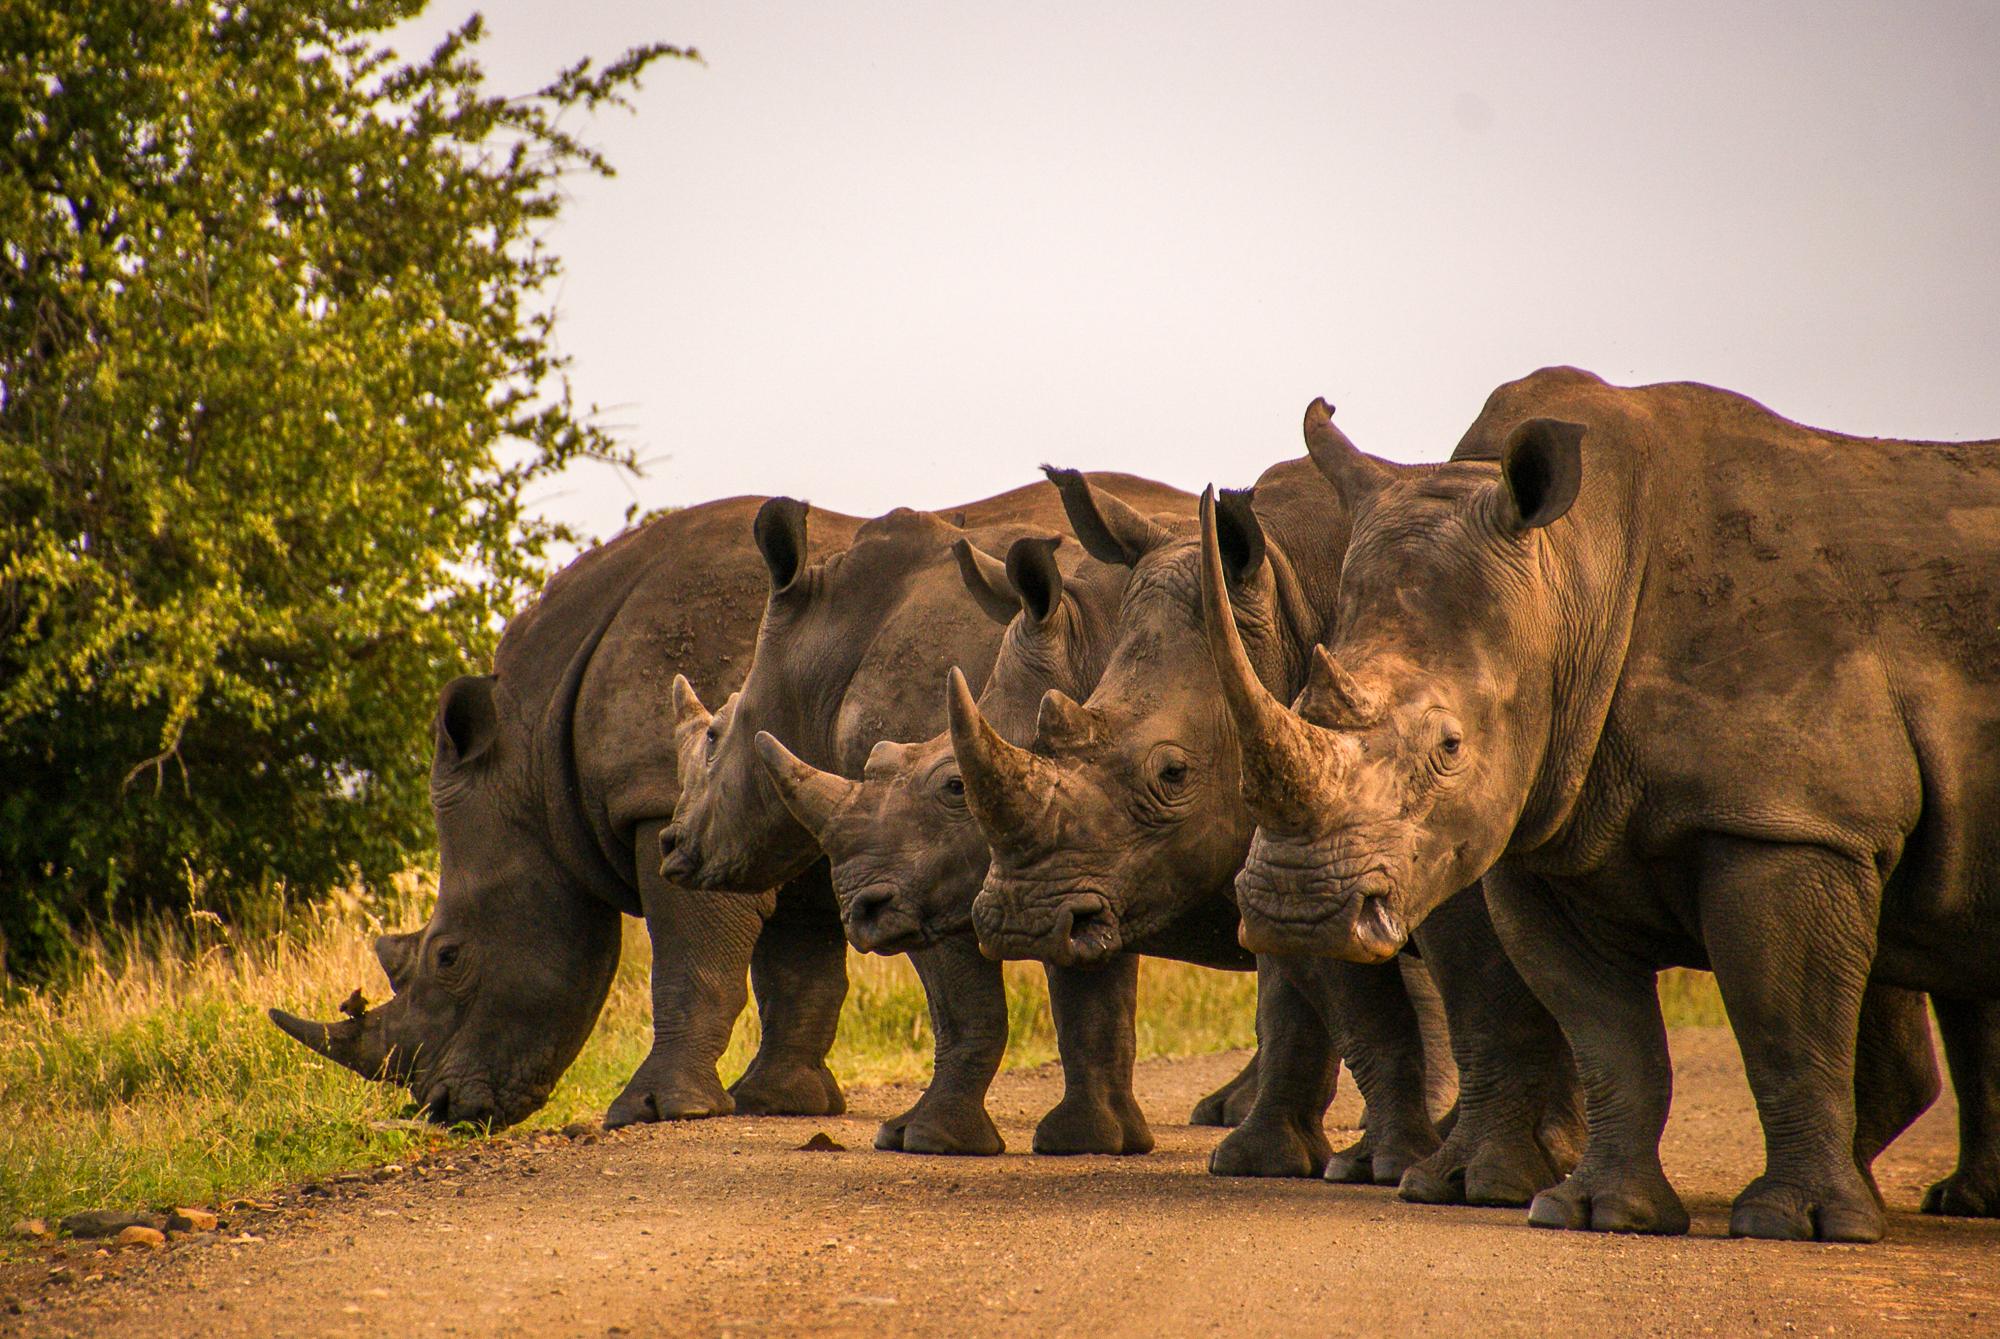 5 neushoorns in Kruger